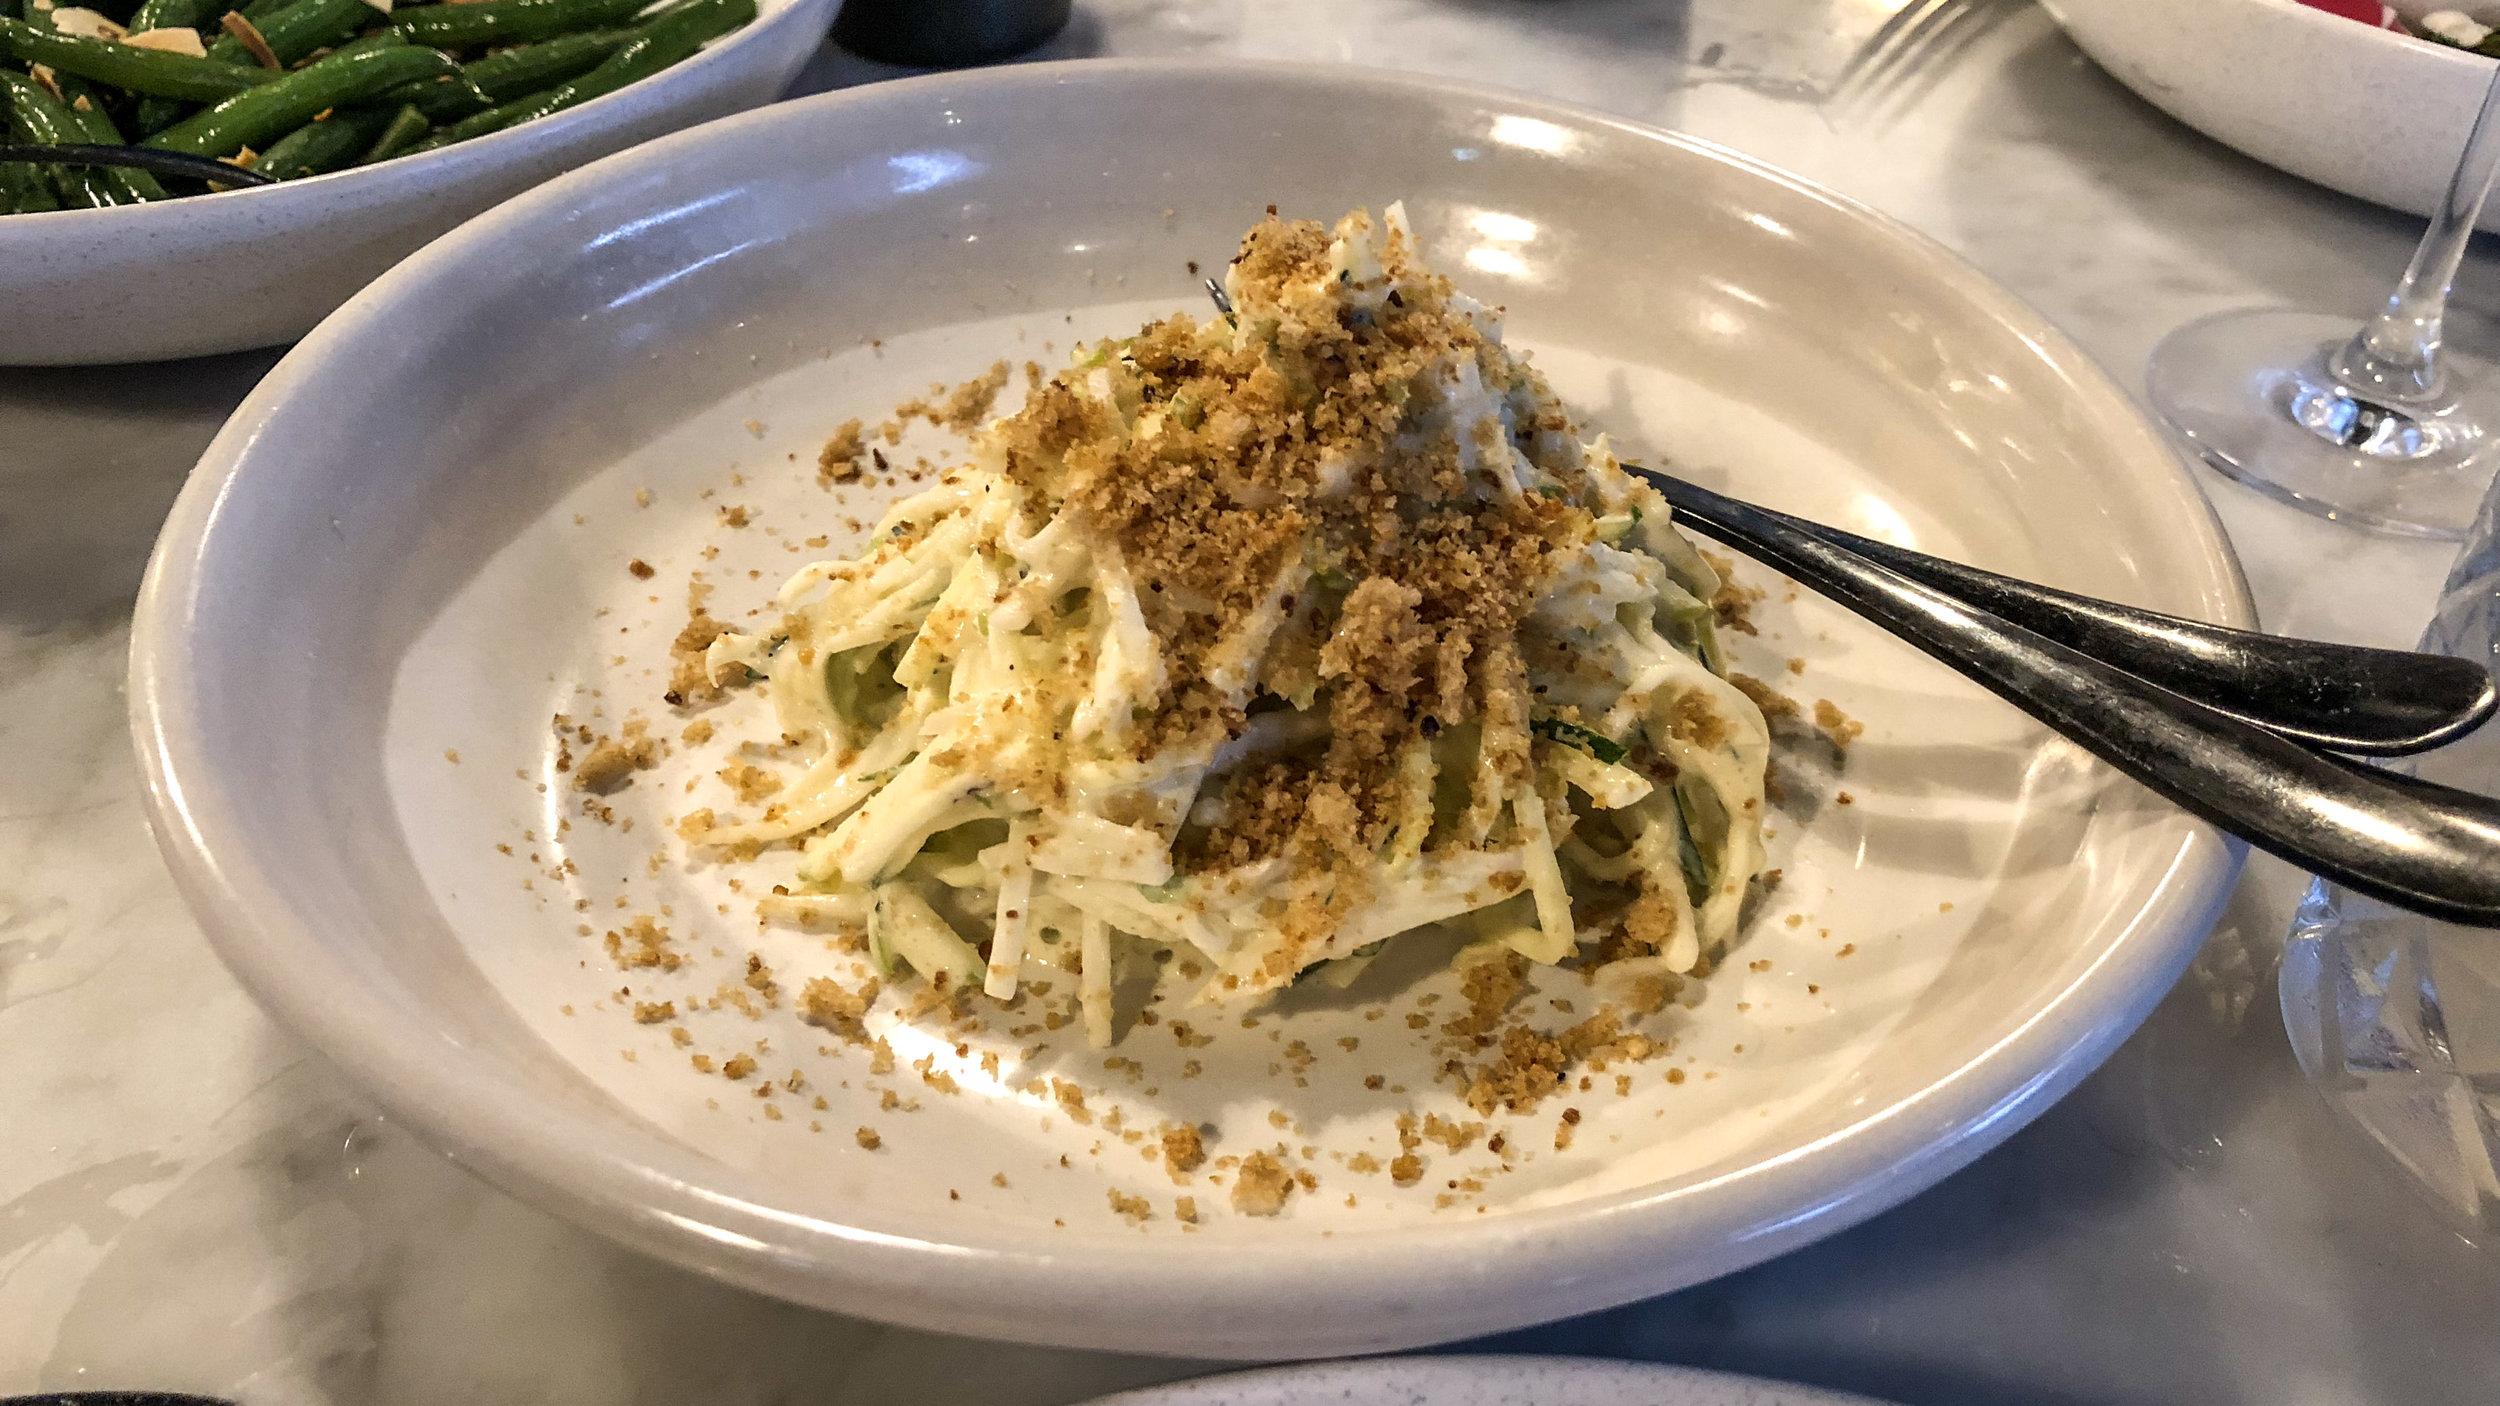 fish_love_fish_barangaroo_sydney_city_cbd_restaurant_bistro_lunch_sustainable_seafood_remoulade